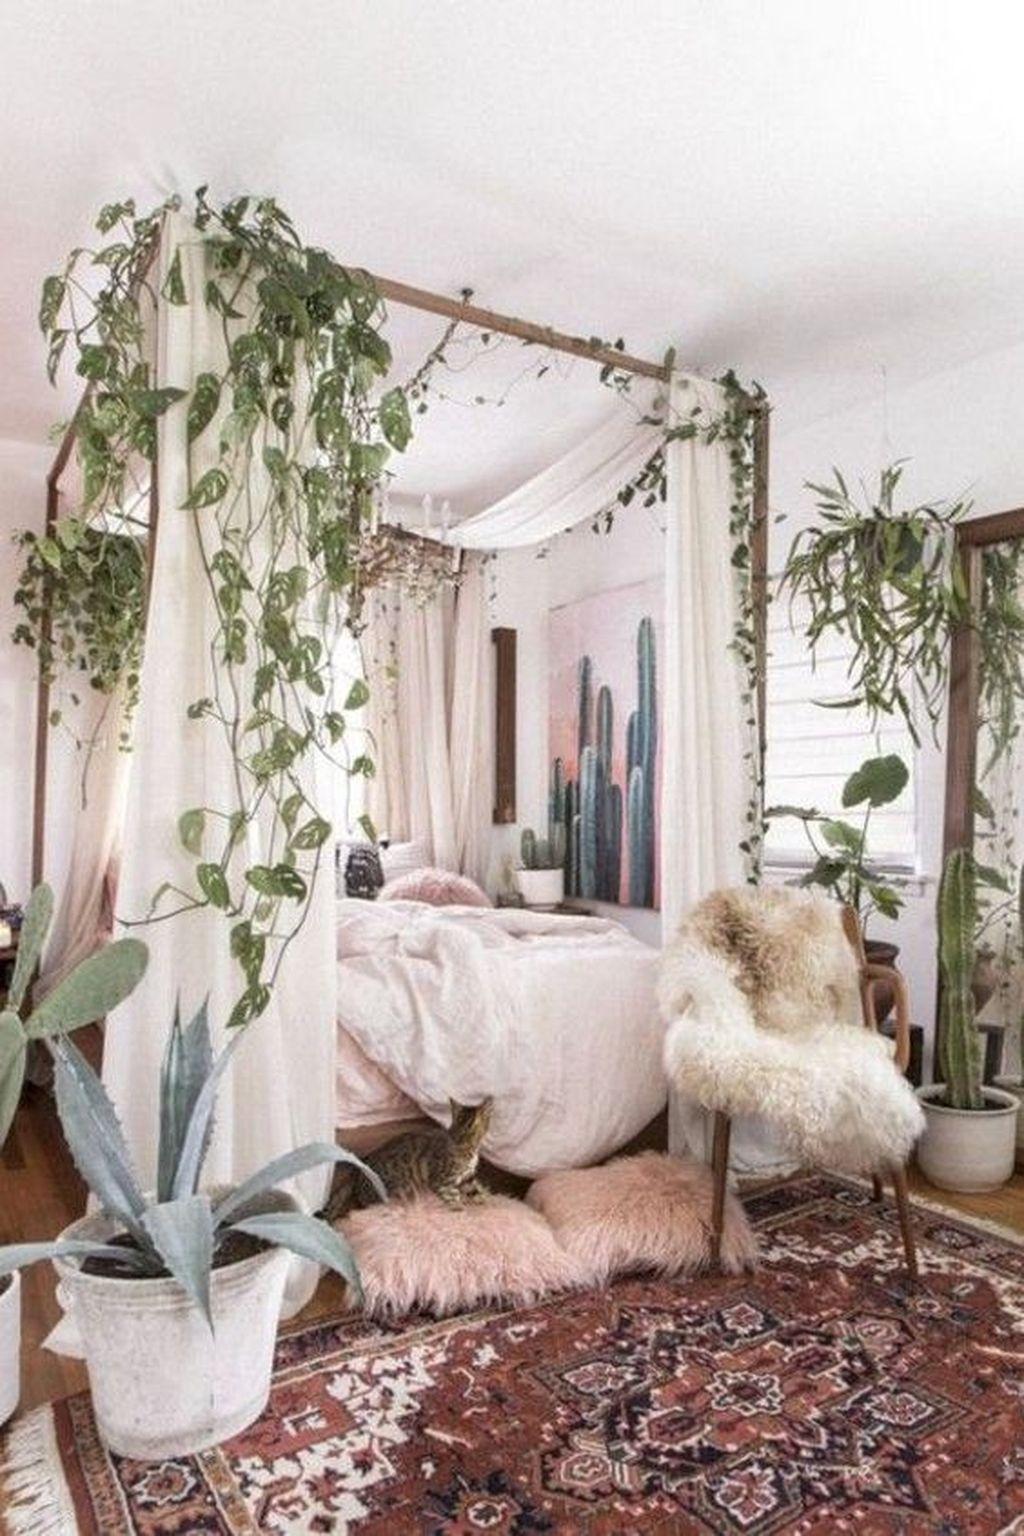 Awesome Boho Chic Bedroom Decor Ideas 07